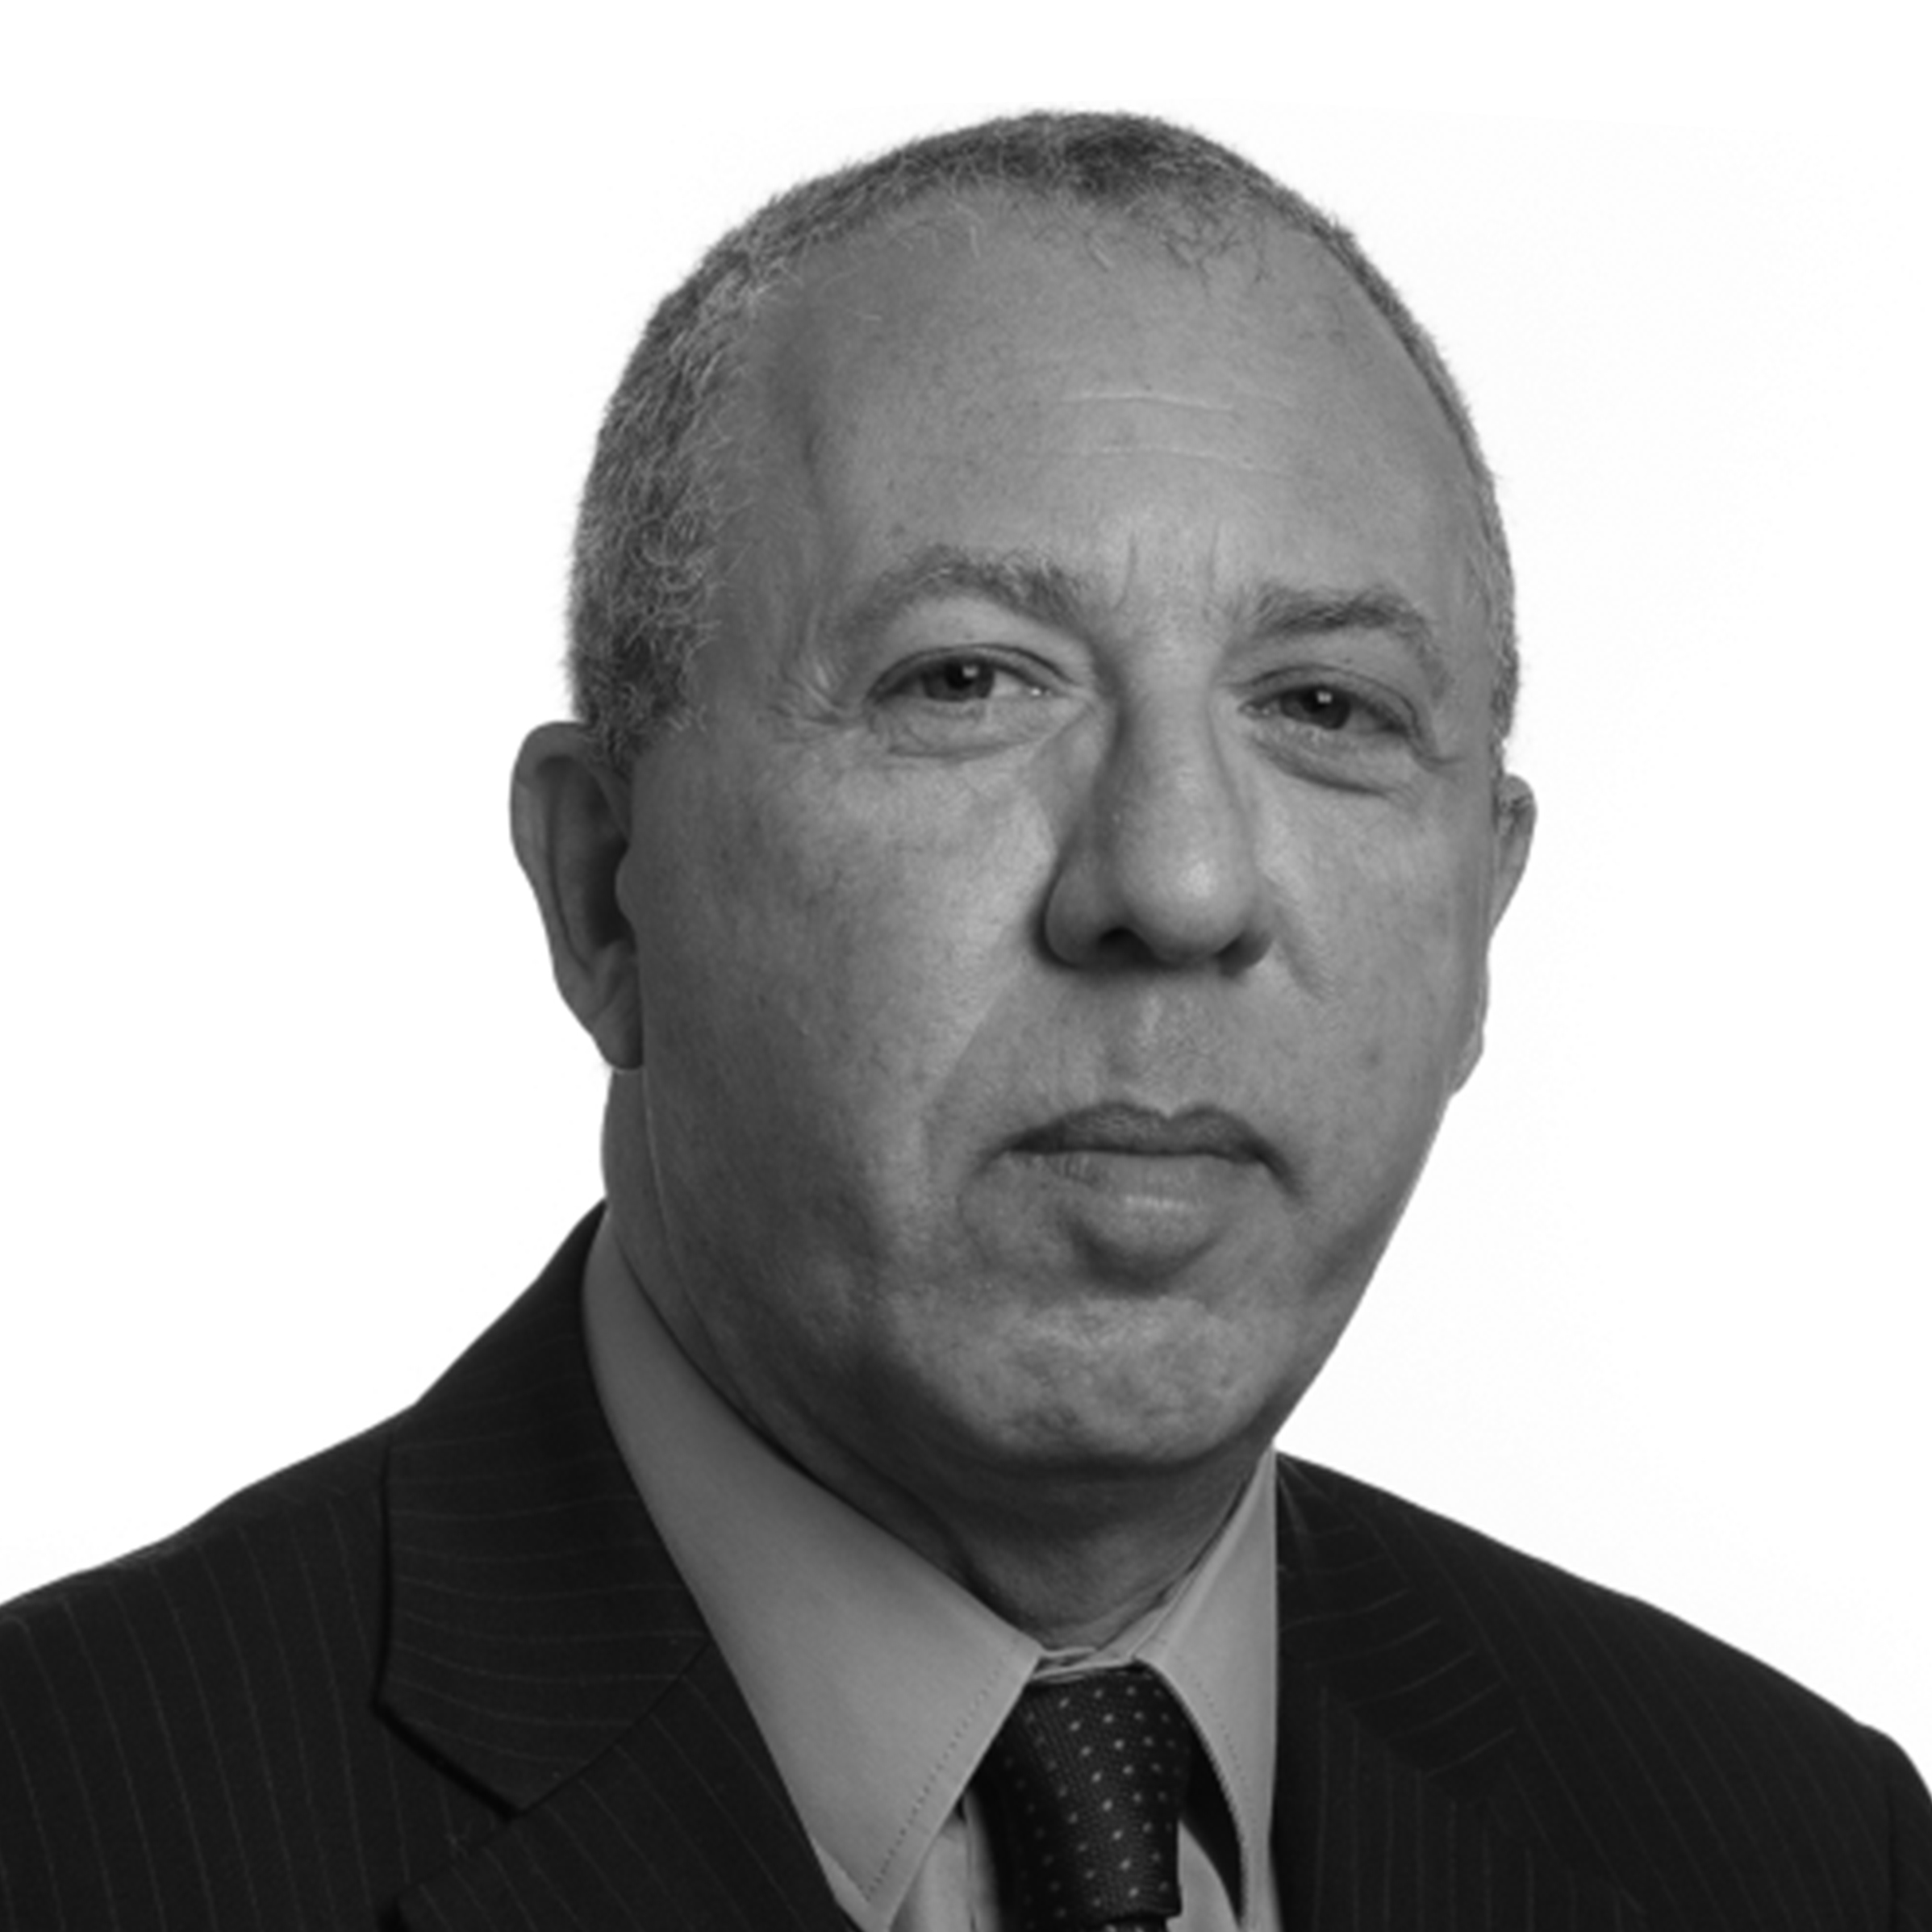 TONY GIMPLE    Founder,     Less Tax 4 Landlords